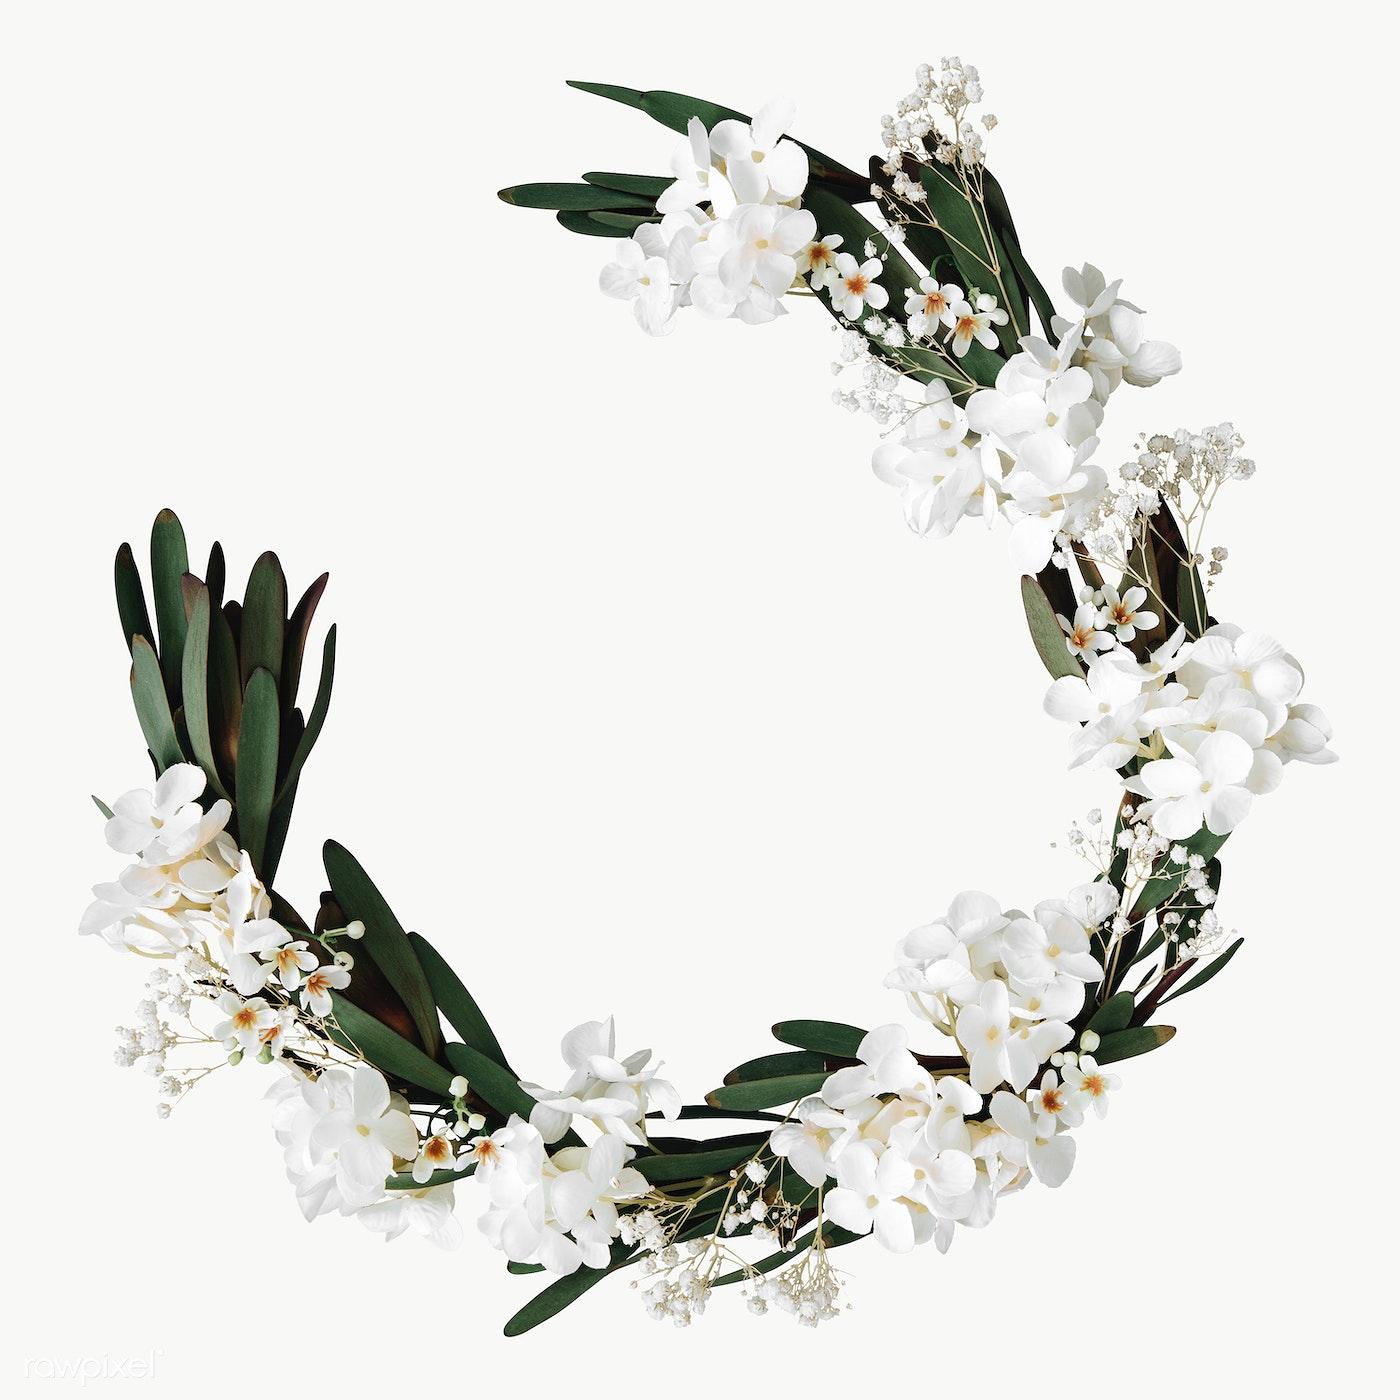 36 best flower arrangement ideas and designs for 2019.htm free stock images  vectors   psd mockups rawpixel  vectors   psd mockups rawpixel